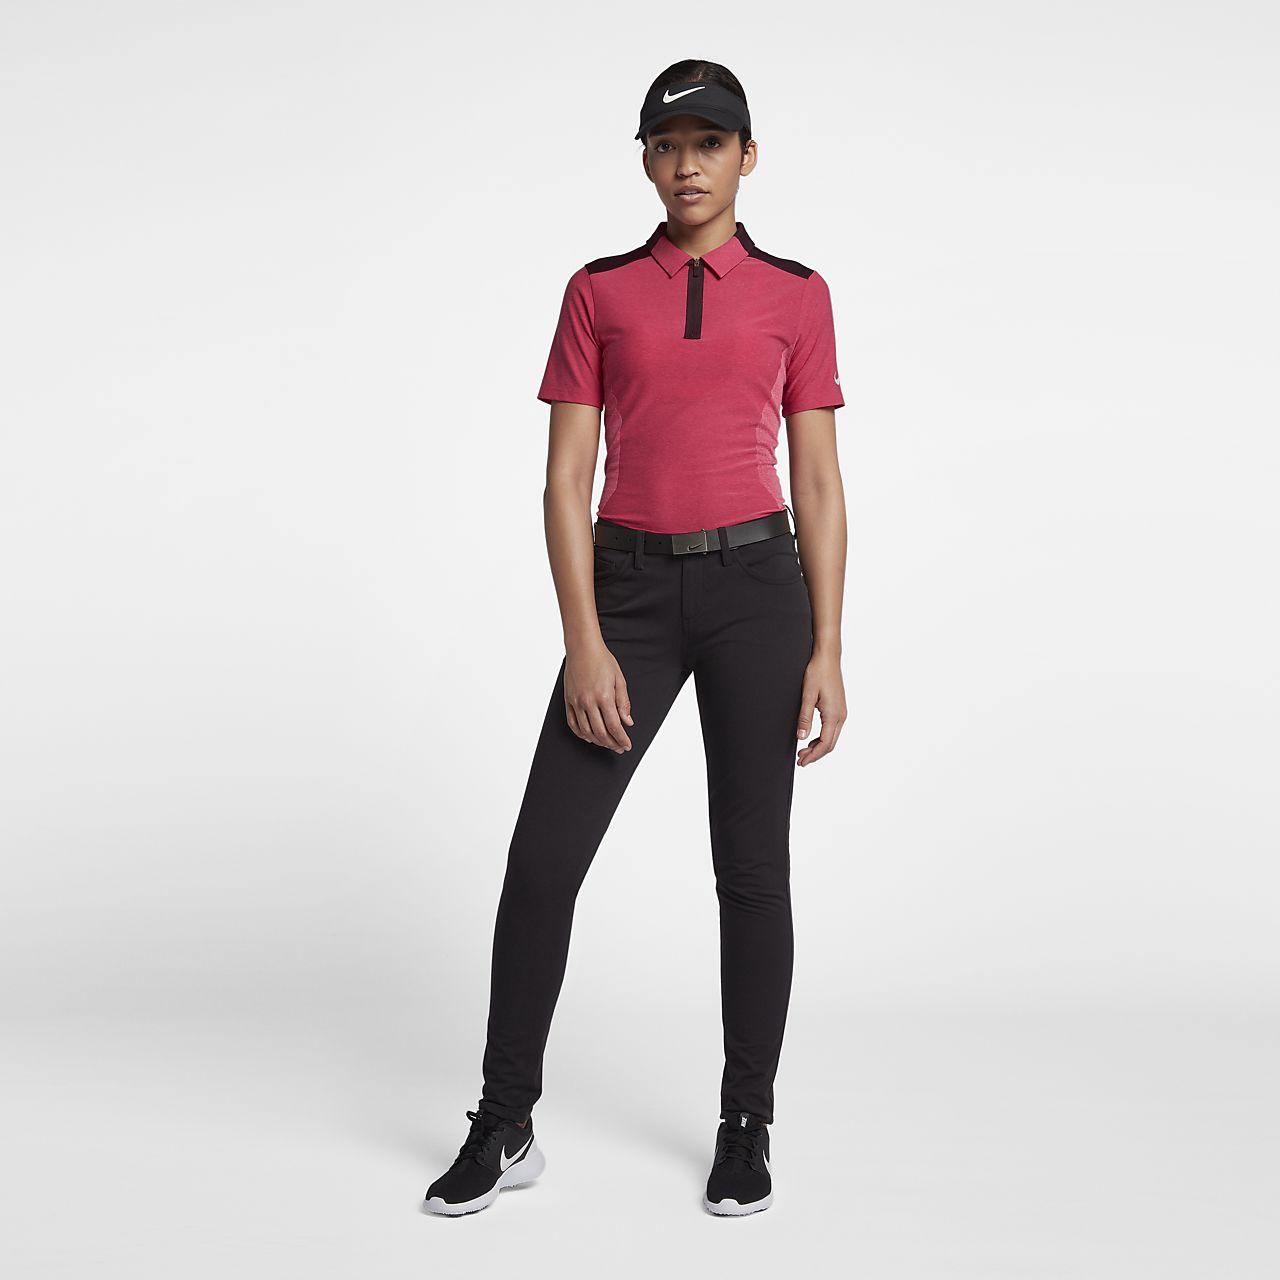 f396000b0029 Γυναικεία μπλούζα πόλο για γκολφ Nike Zonal Cooling. Nike.com GR